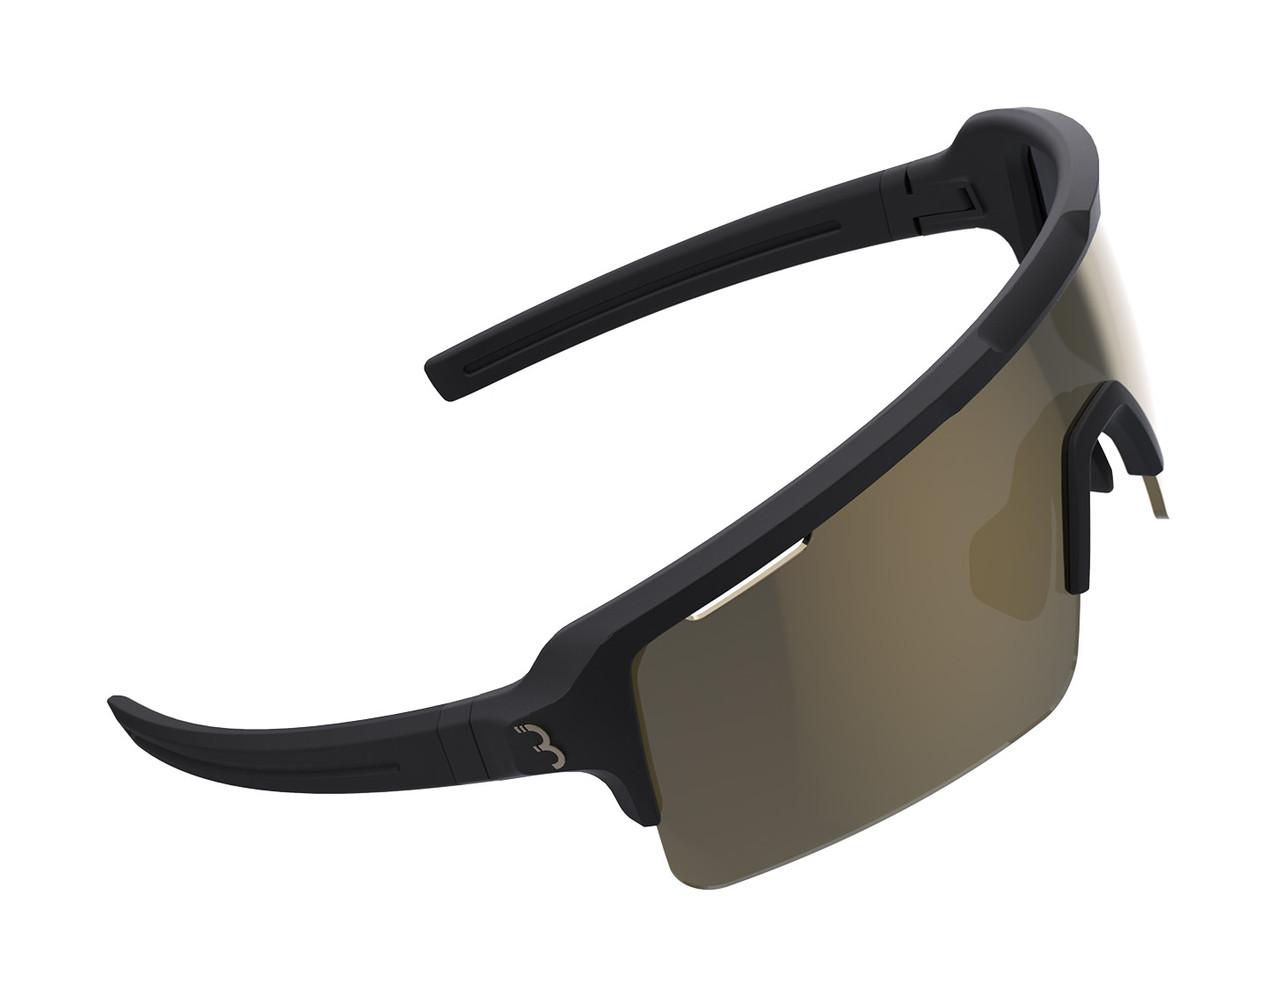 BBB Fuse Sport BSG-65 Sunglasses Matte Black / MLC Gold Lens RRP £72.99